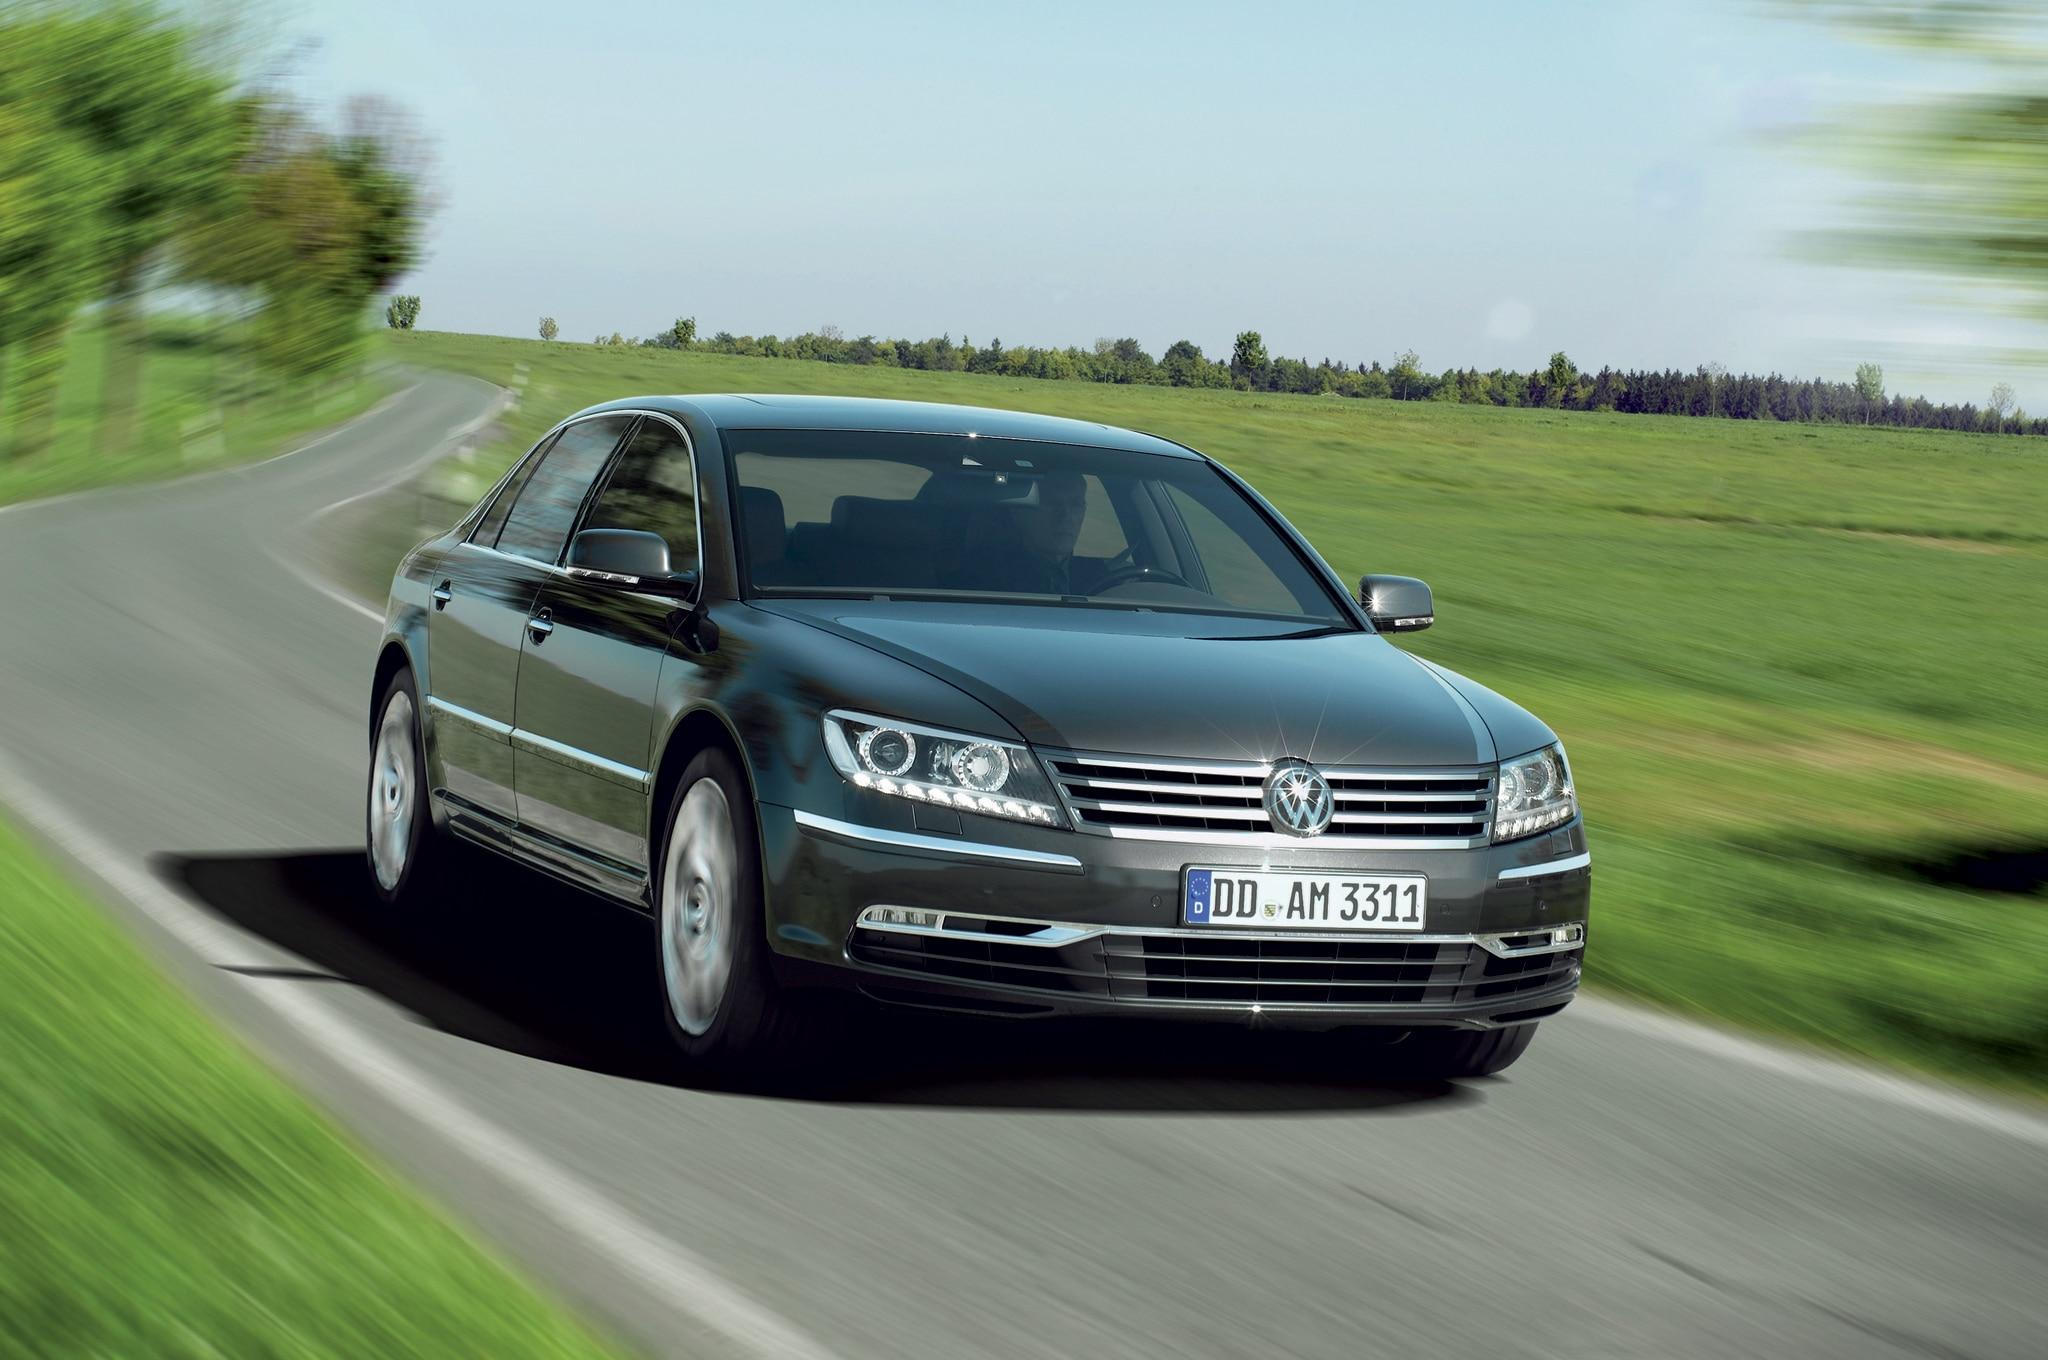 2011 Volkswagen Phaeton Front Three Quarter Motion1